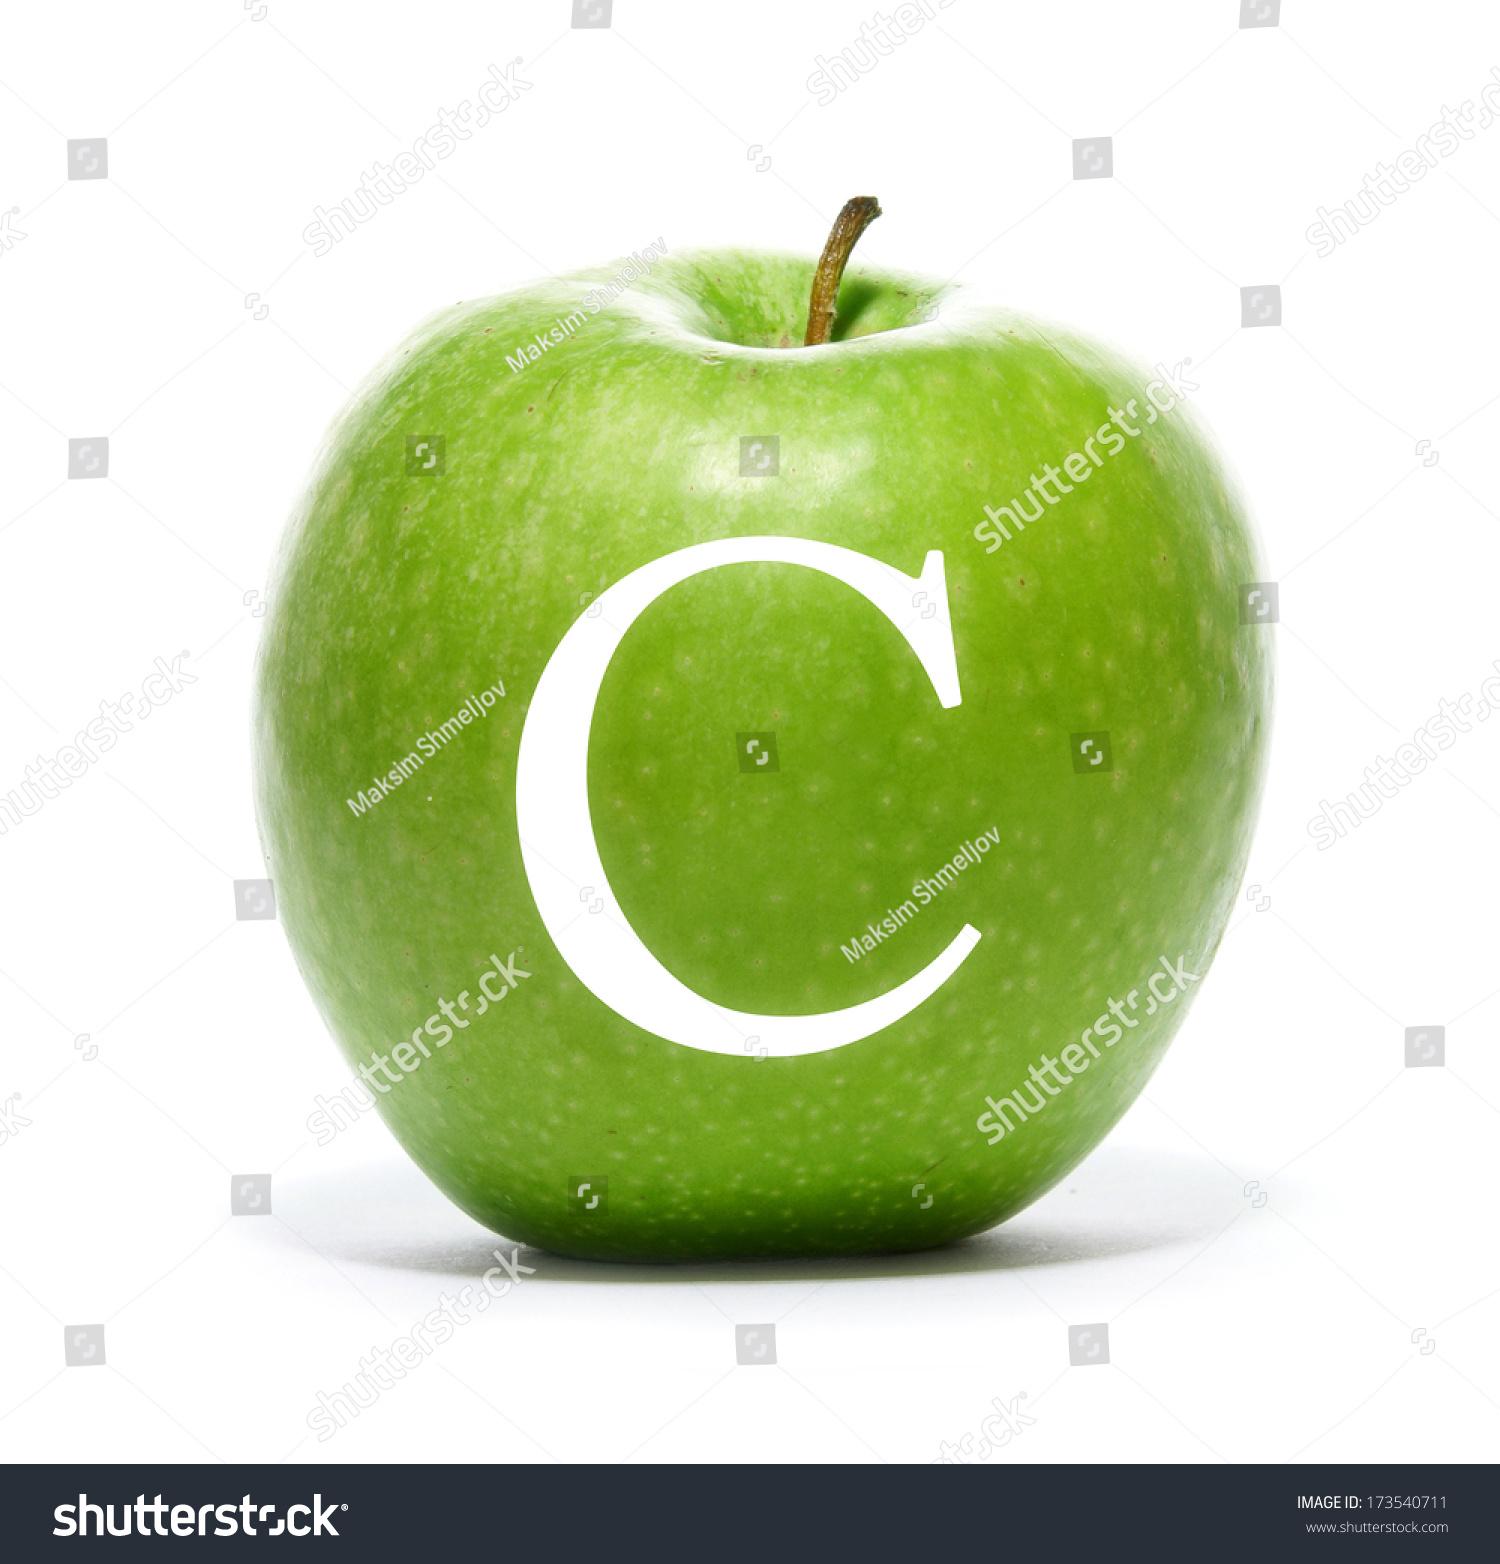 Green Fresh Tasty Apple Vitamin C Stock Photo Edit Now 173540711